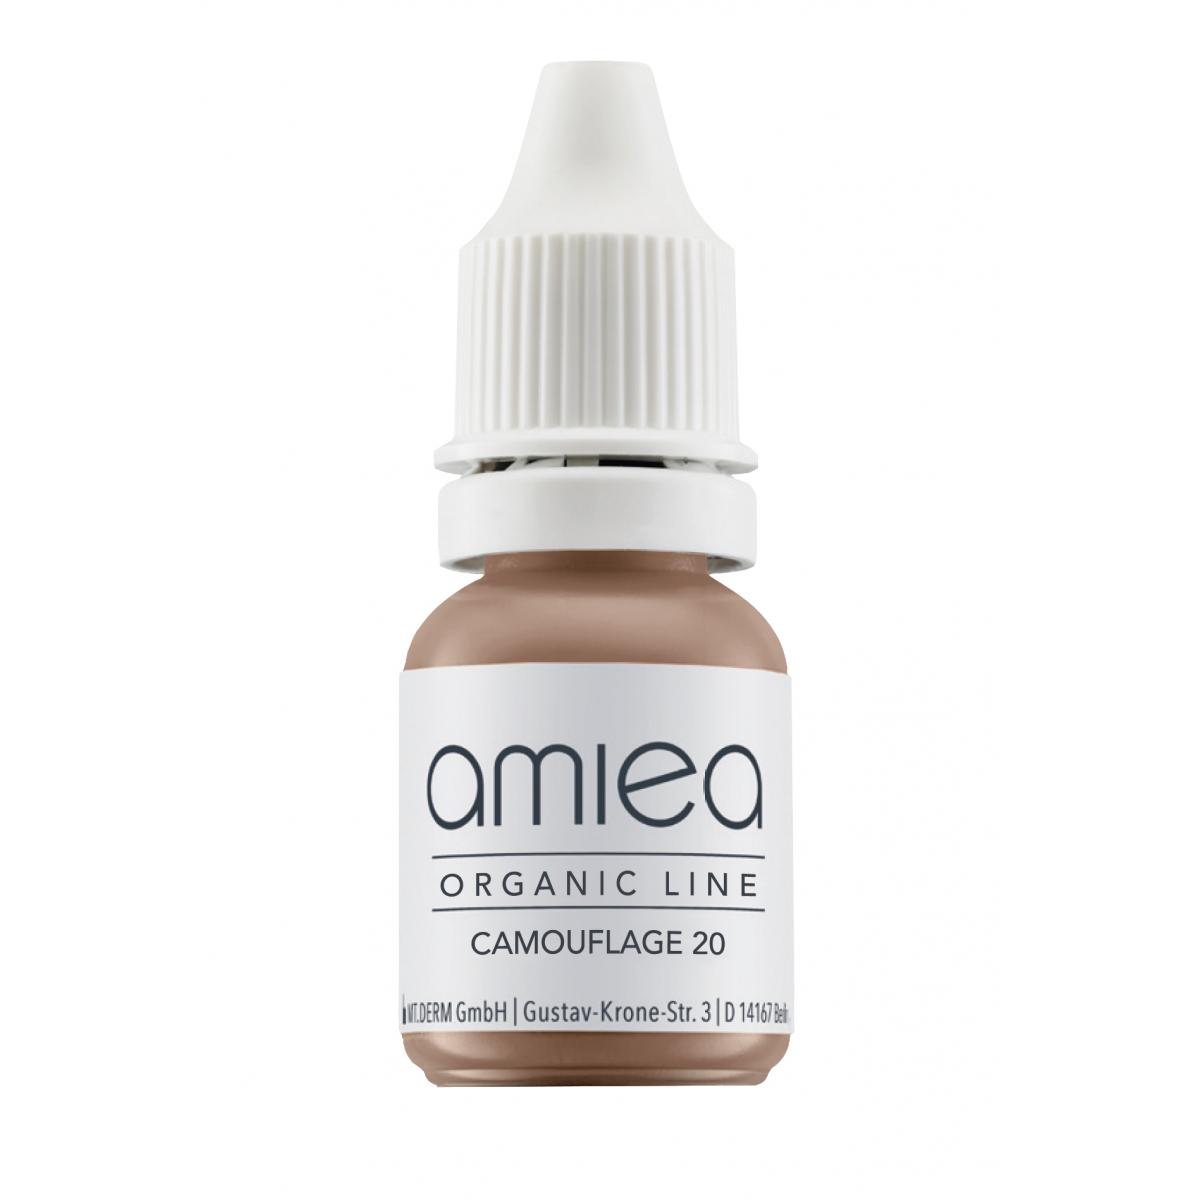 ORGANIC LINE (5ml)  - PIGMENT CAMOUFLAGE 20 ORGANICLINE AMIEA (5 ml)